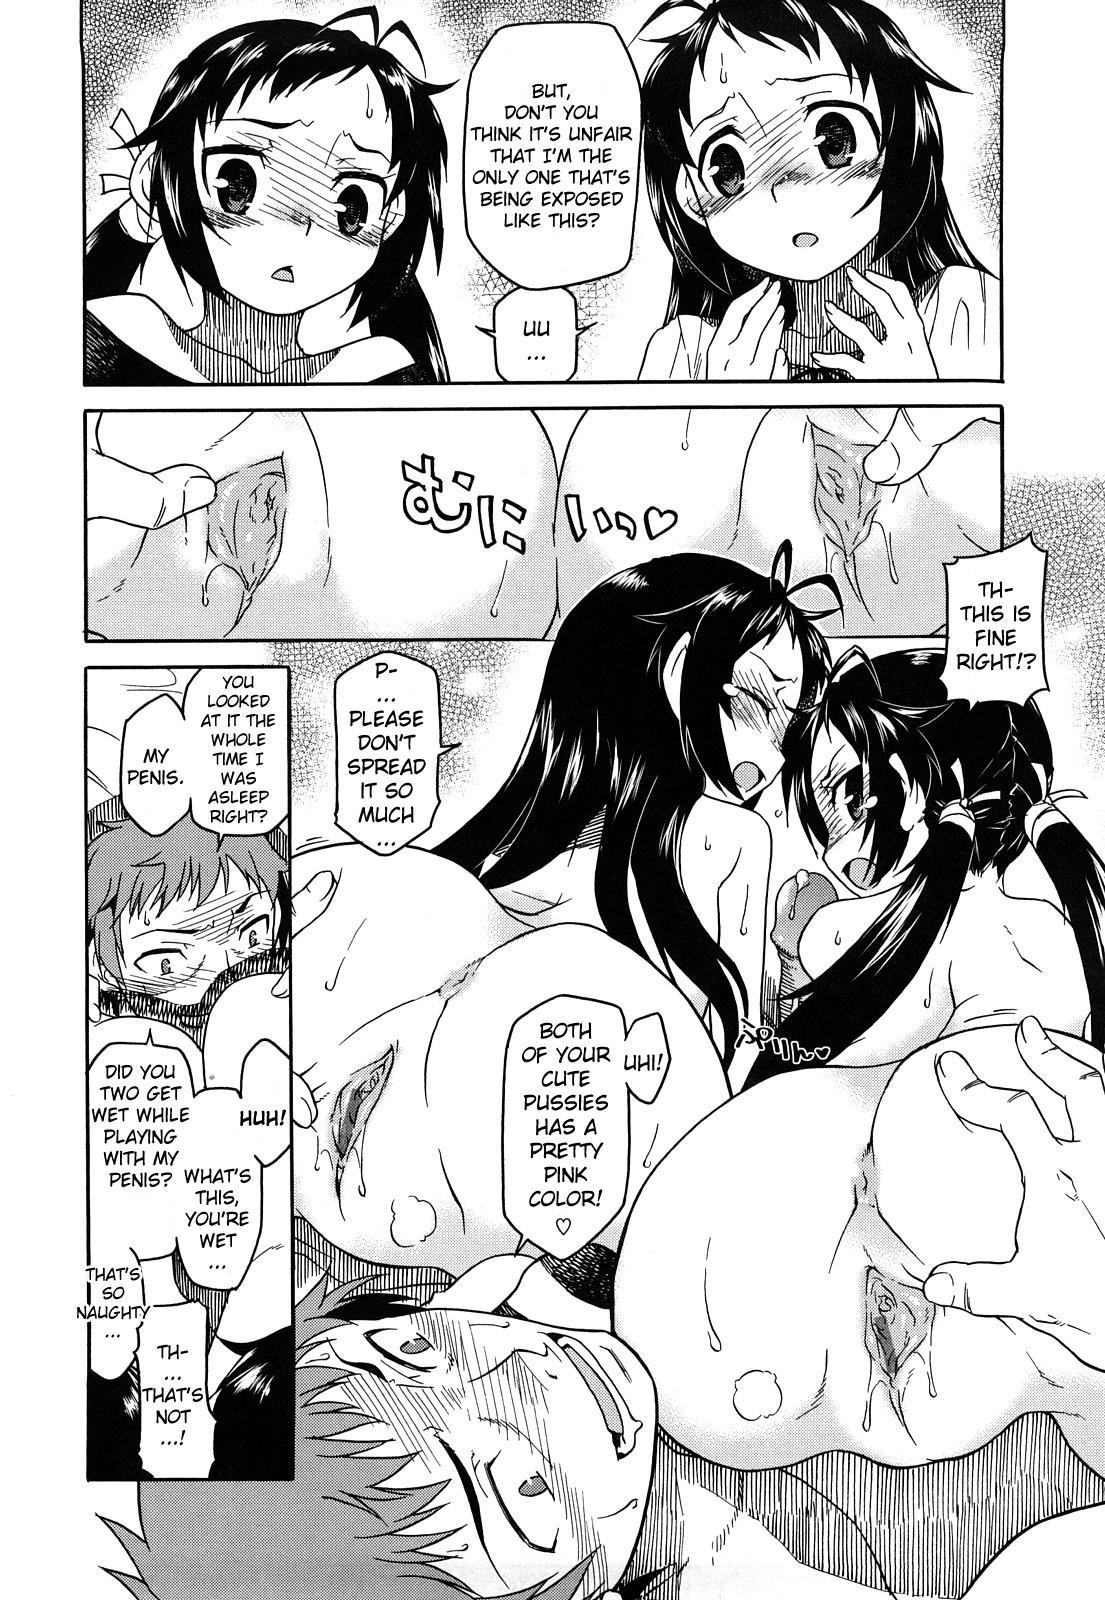 Shinkonsan Gokko Ch. 9 - Show Us Your Penis 11